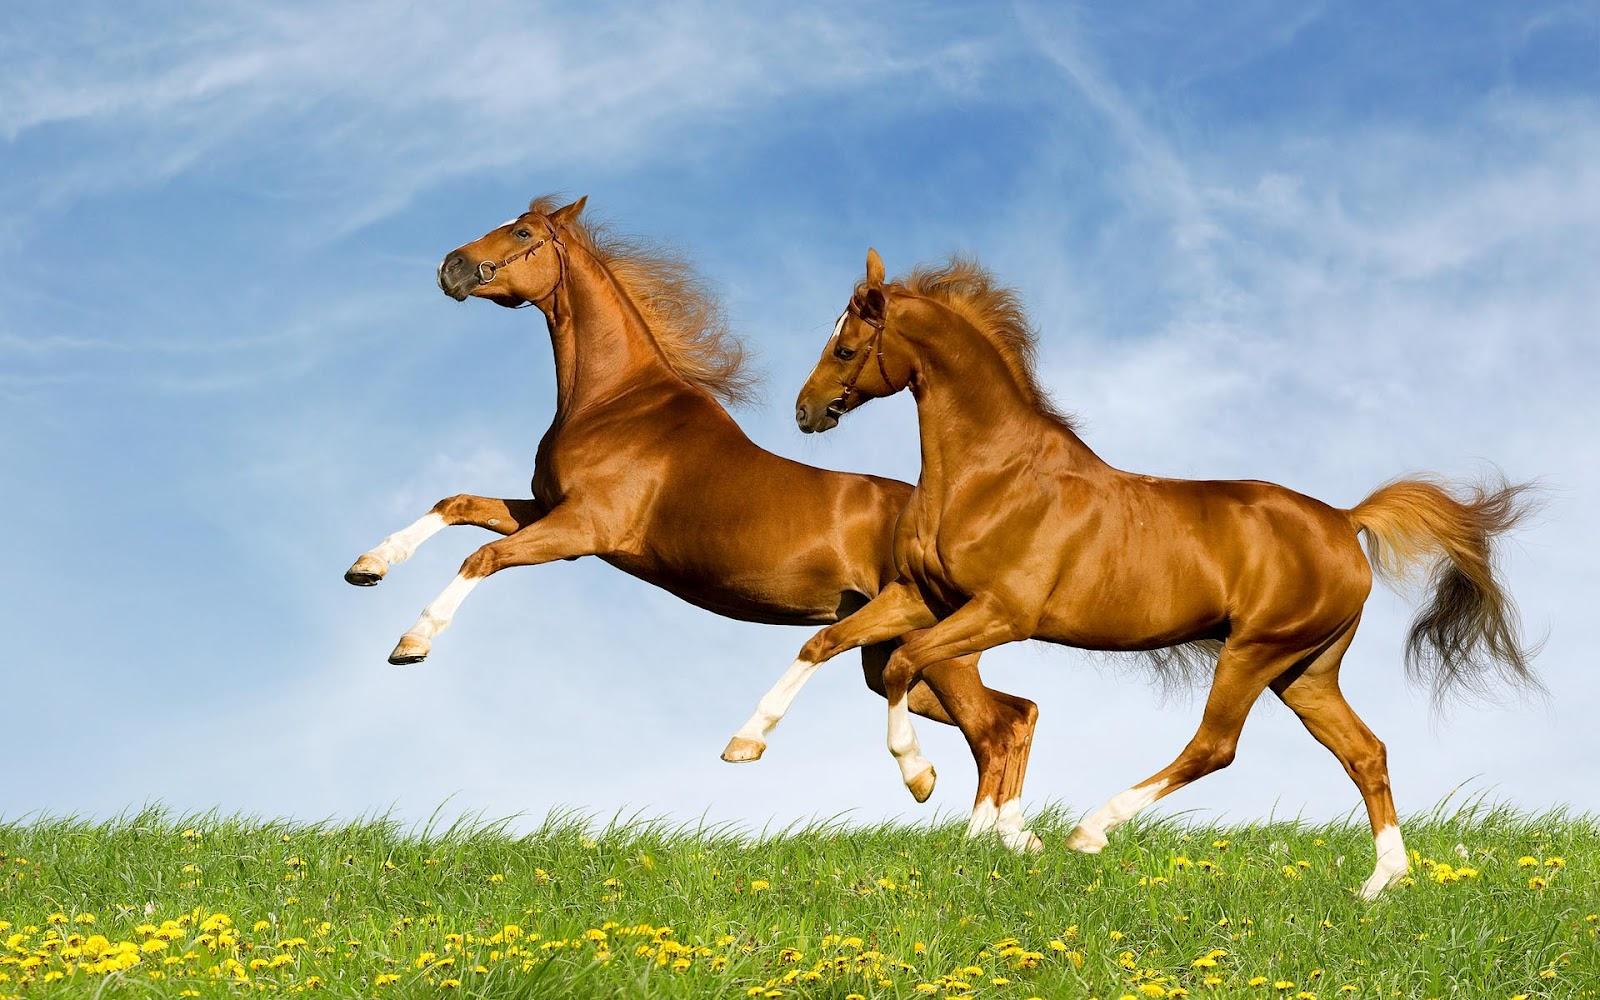 Amazing   Wallpaper Horse Cartoon - horse+wallpapers+hd+(11)  Snapshot_586091.jpg